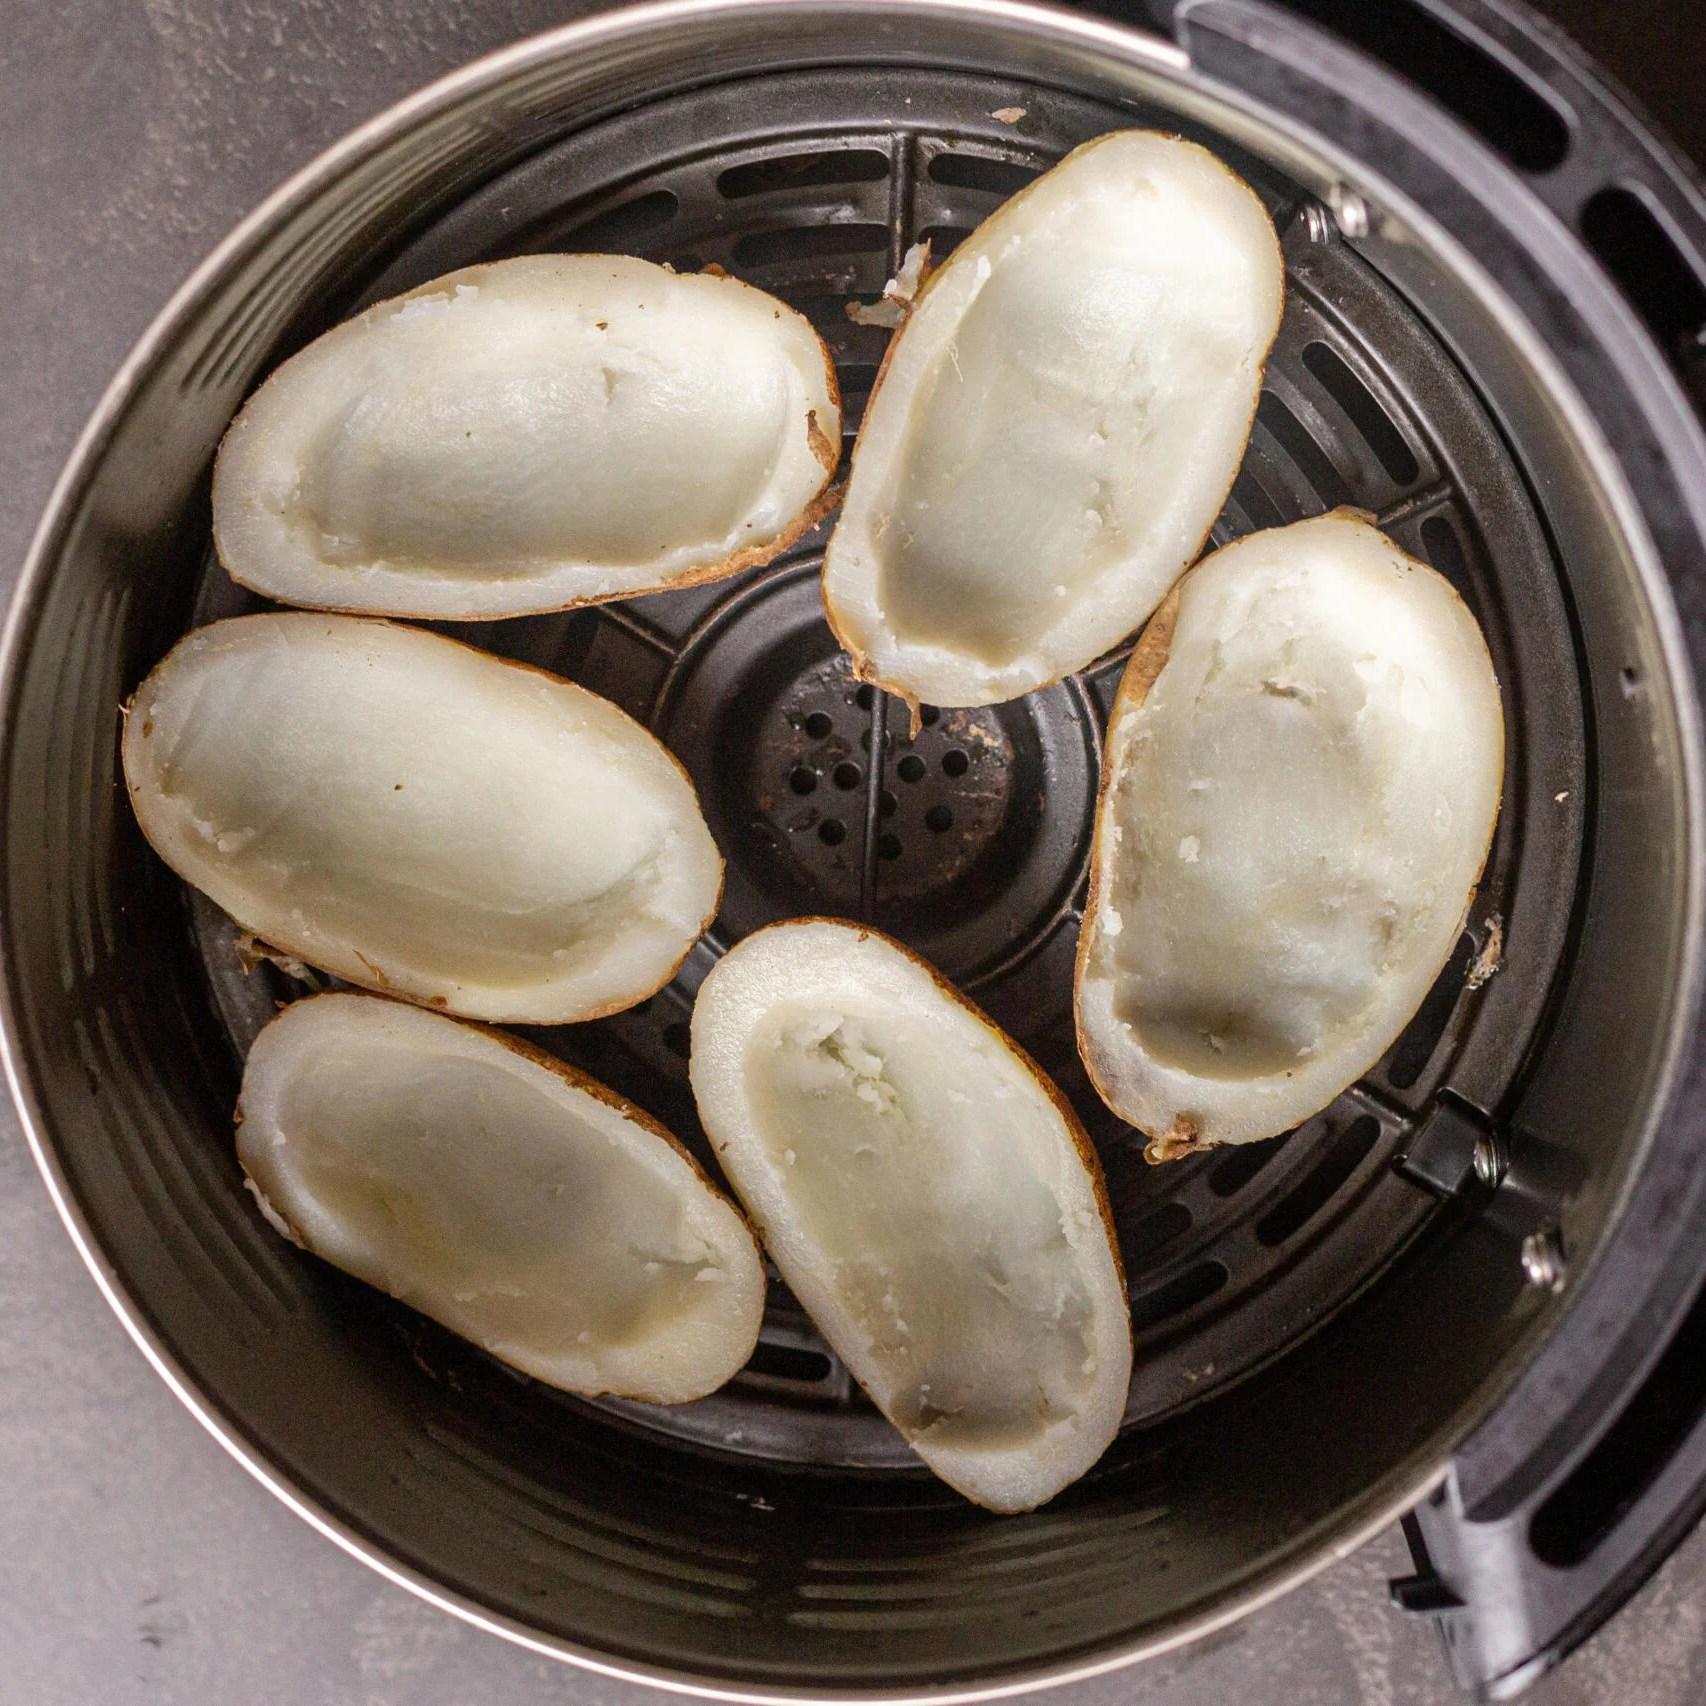 Potato skins in an air fryer basket